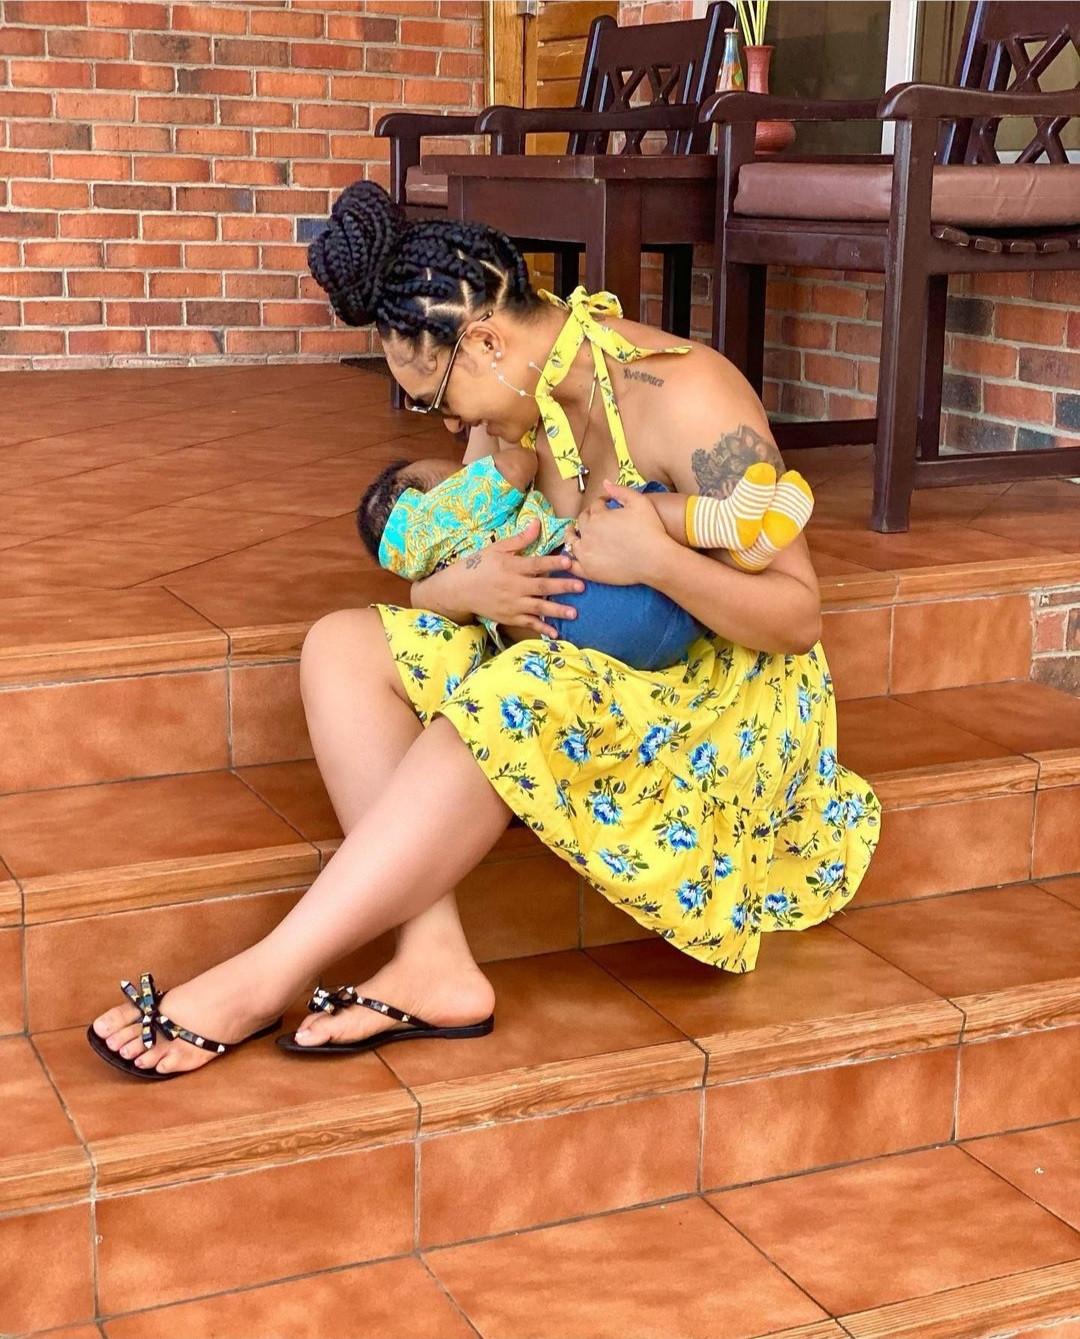 Rosy Meurer shares breastfeeding photo alongside photos of her bonding with her newborn son